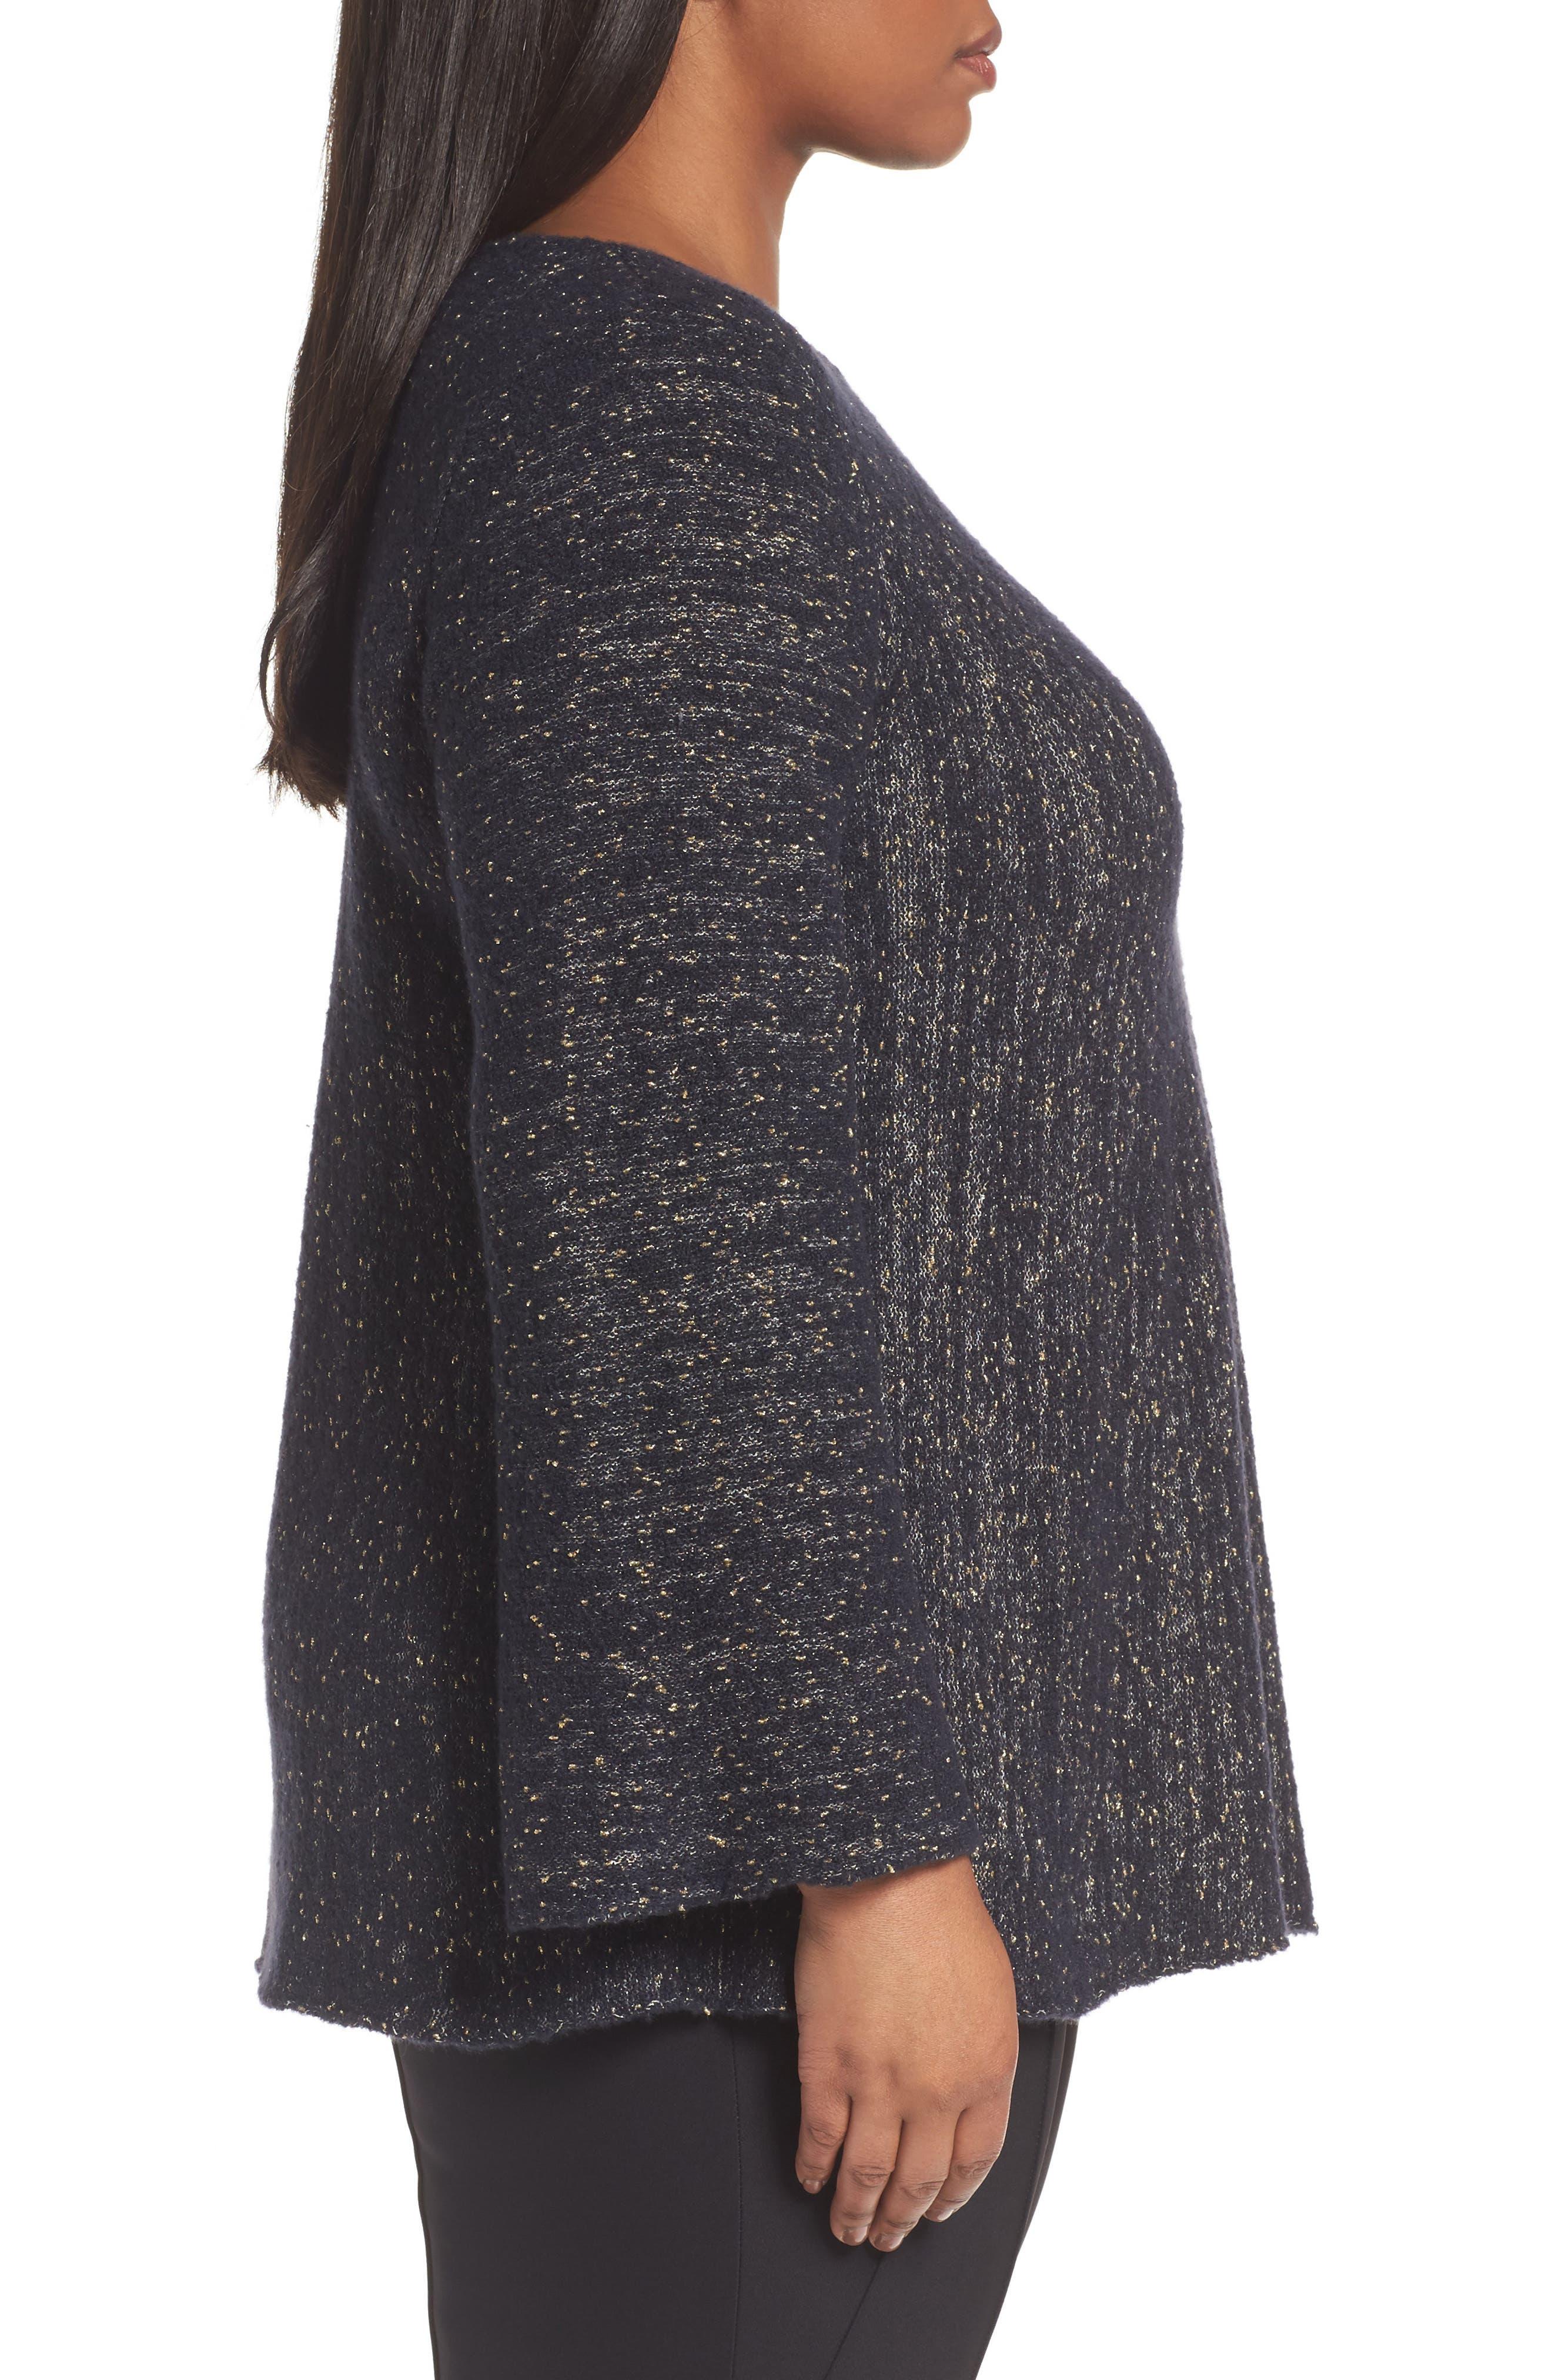 Lafayette 148 Metallic Knit A-Line Sweater,                             Alternate thumbnail 3, color,                             479